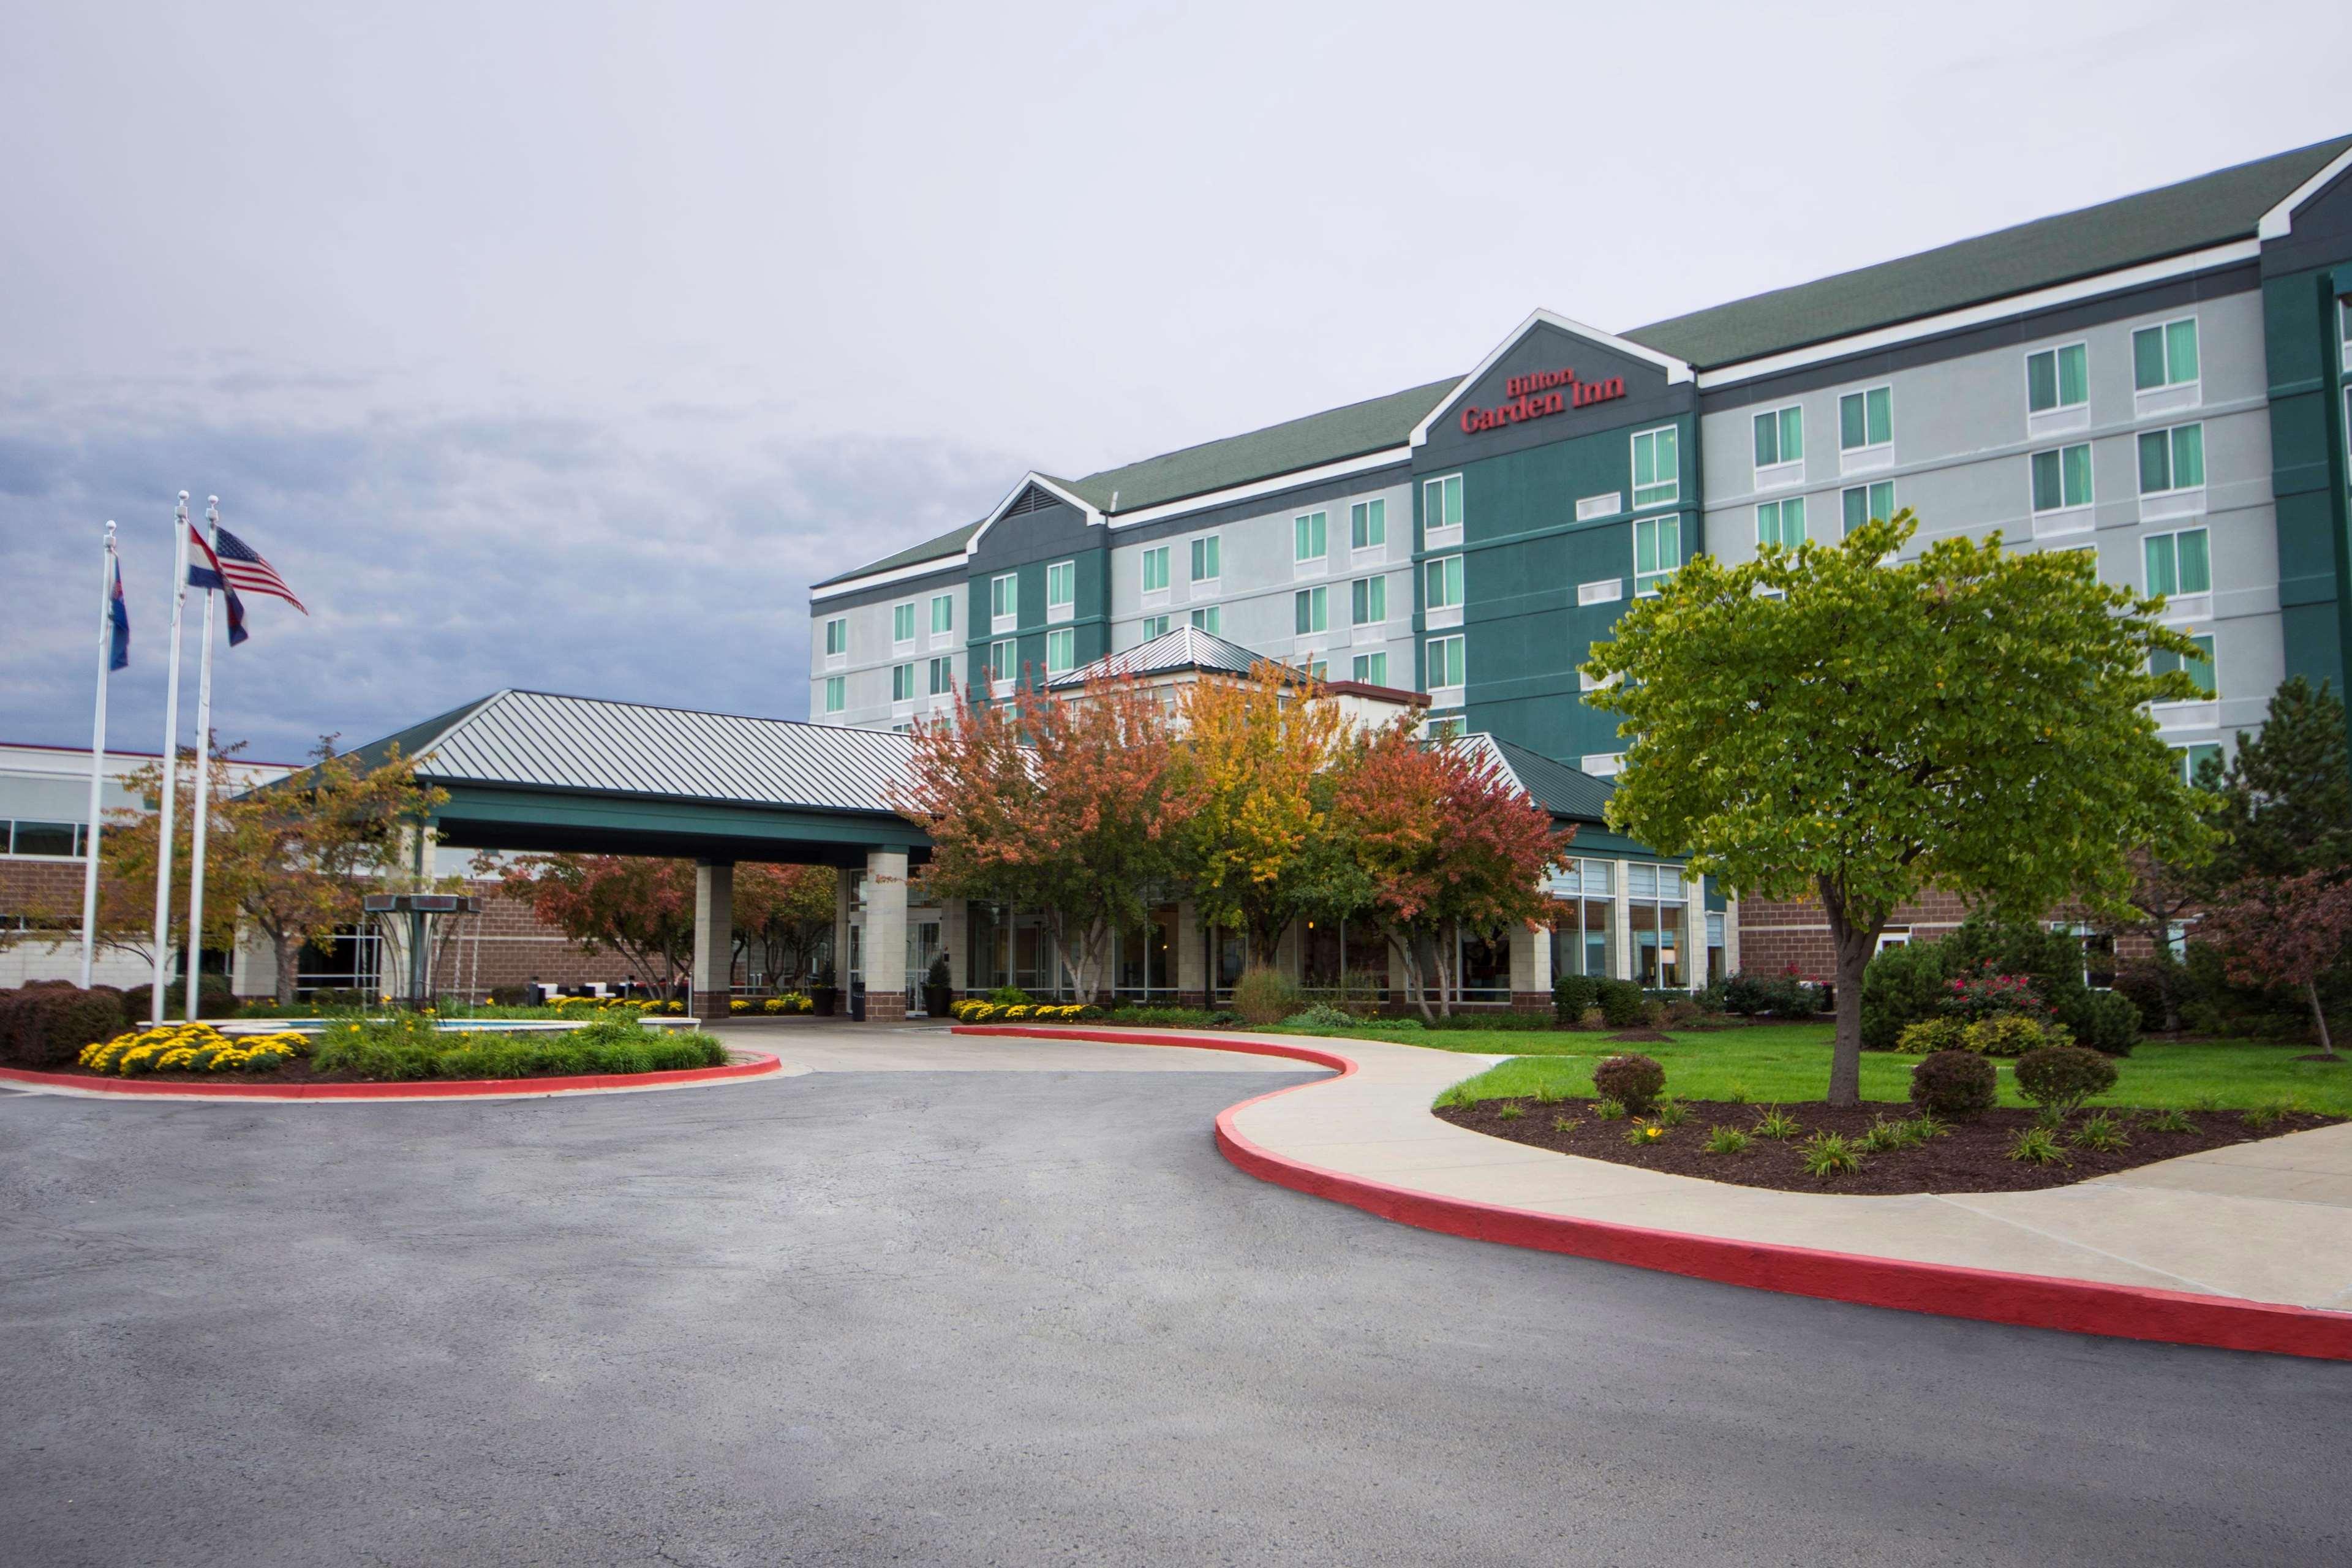 Hilton Garden Inn Independence Independence Missouri Mo